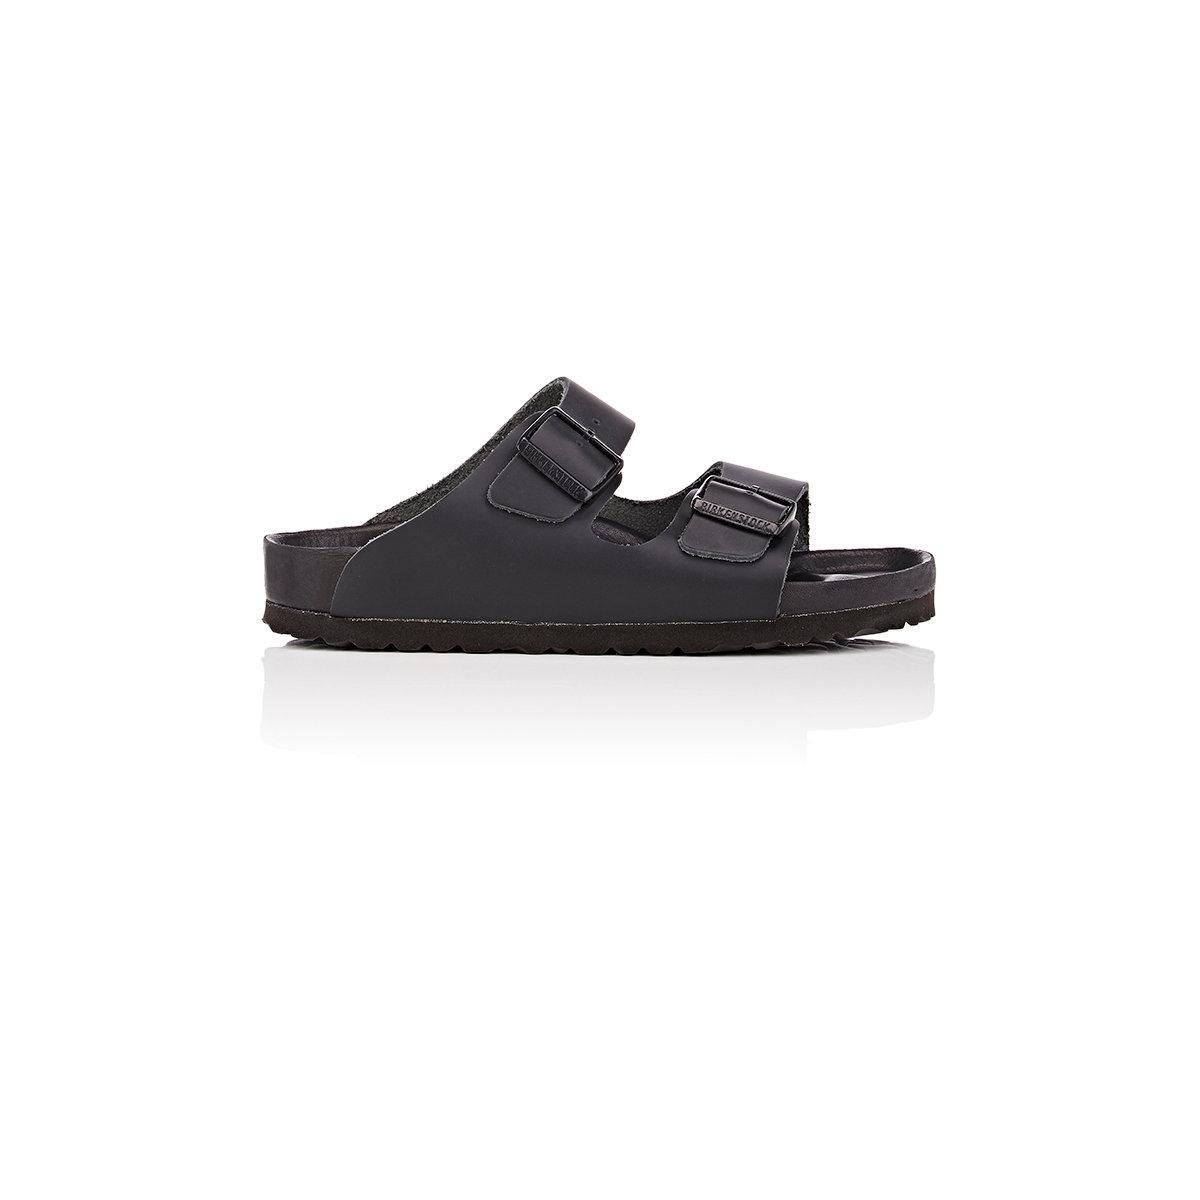 788361fdb09 Lyst - Birkenstock Monterey Leather Sandals in Black for Men